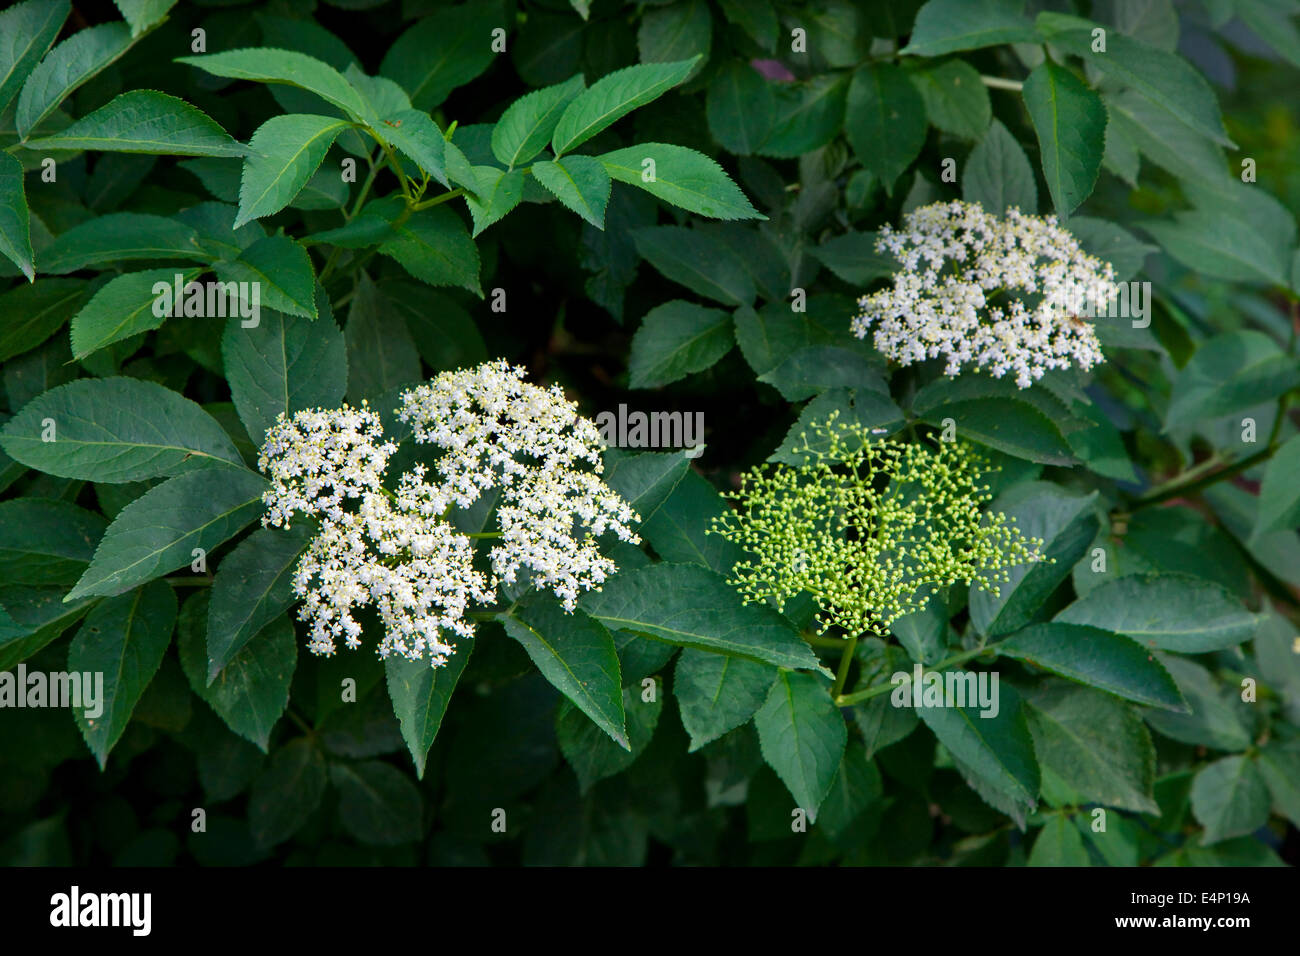 European elder / European elderberry (Sambucus nigra) in flower in spring - Stock Image